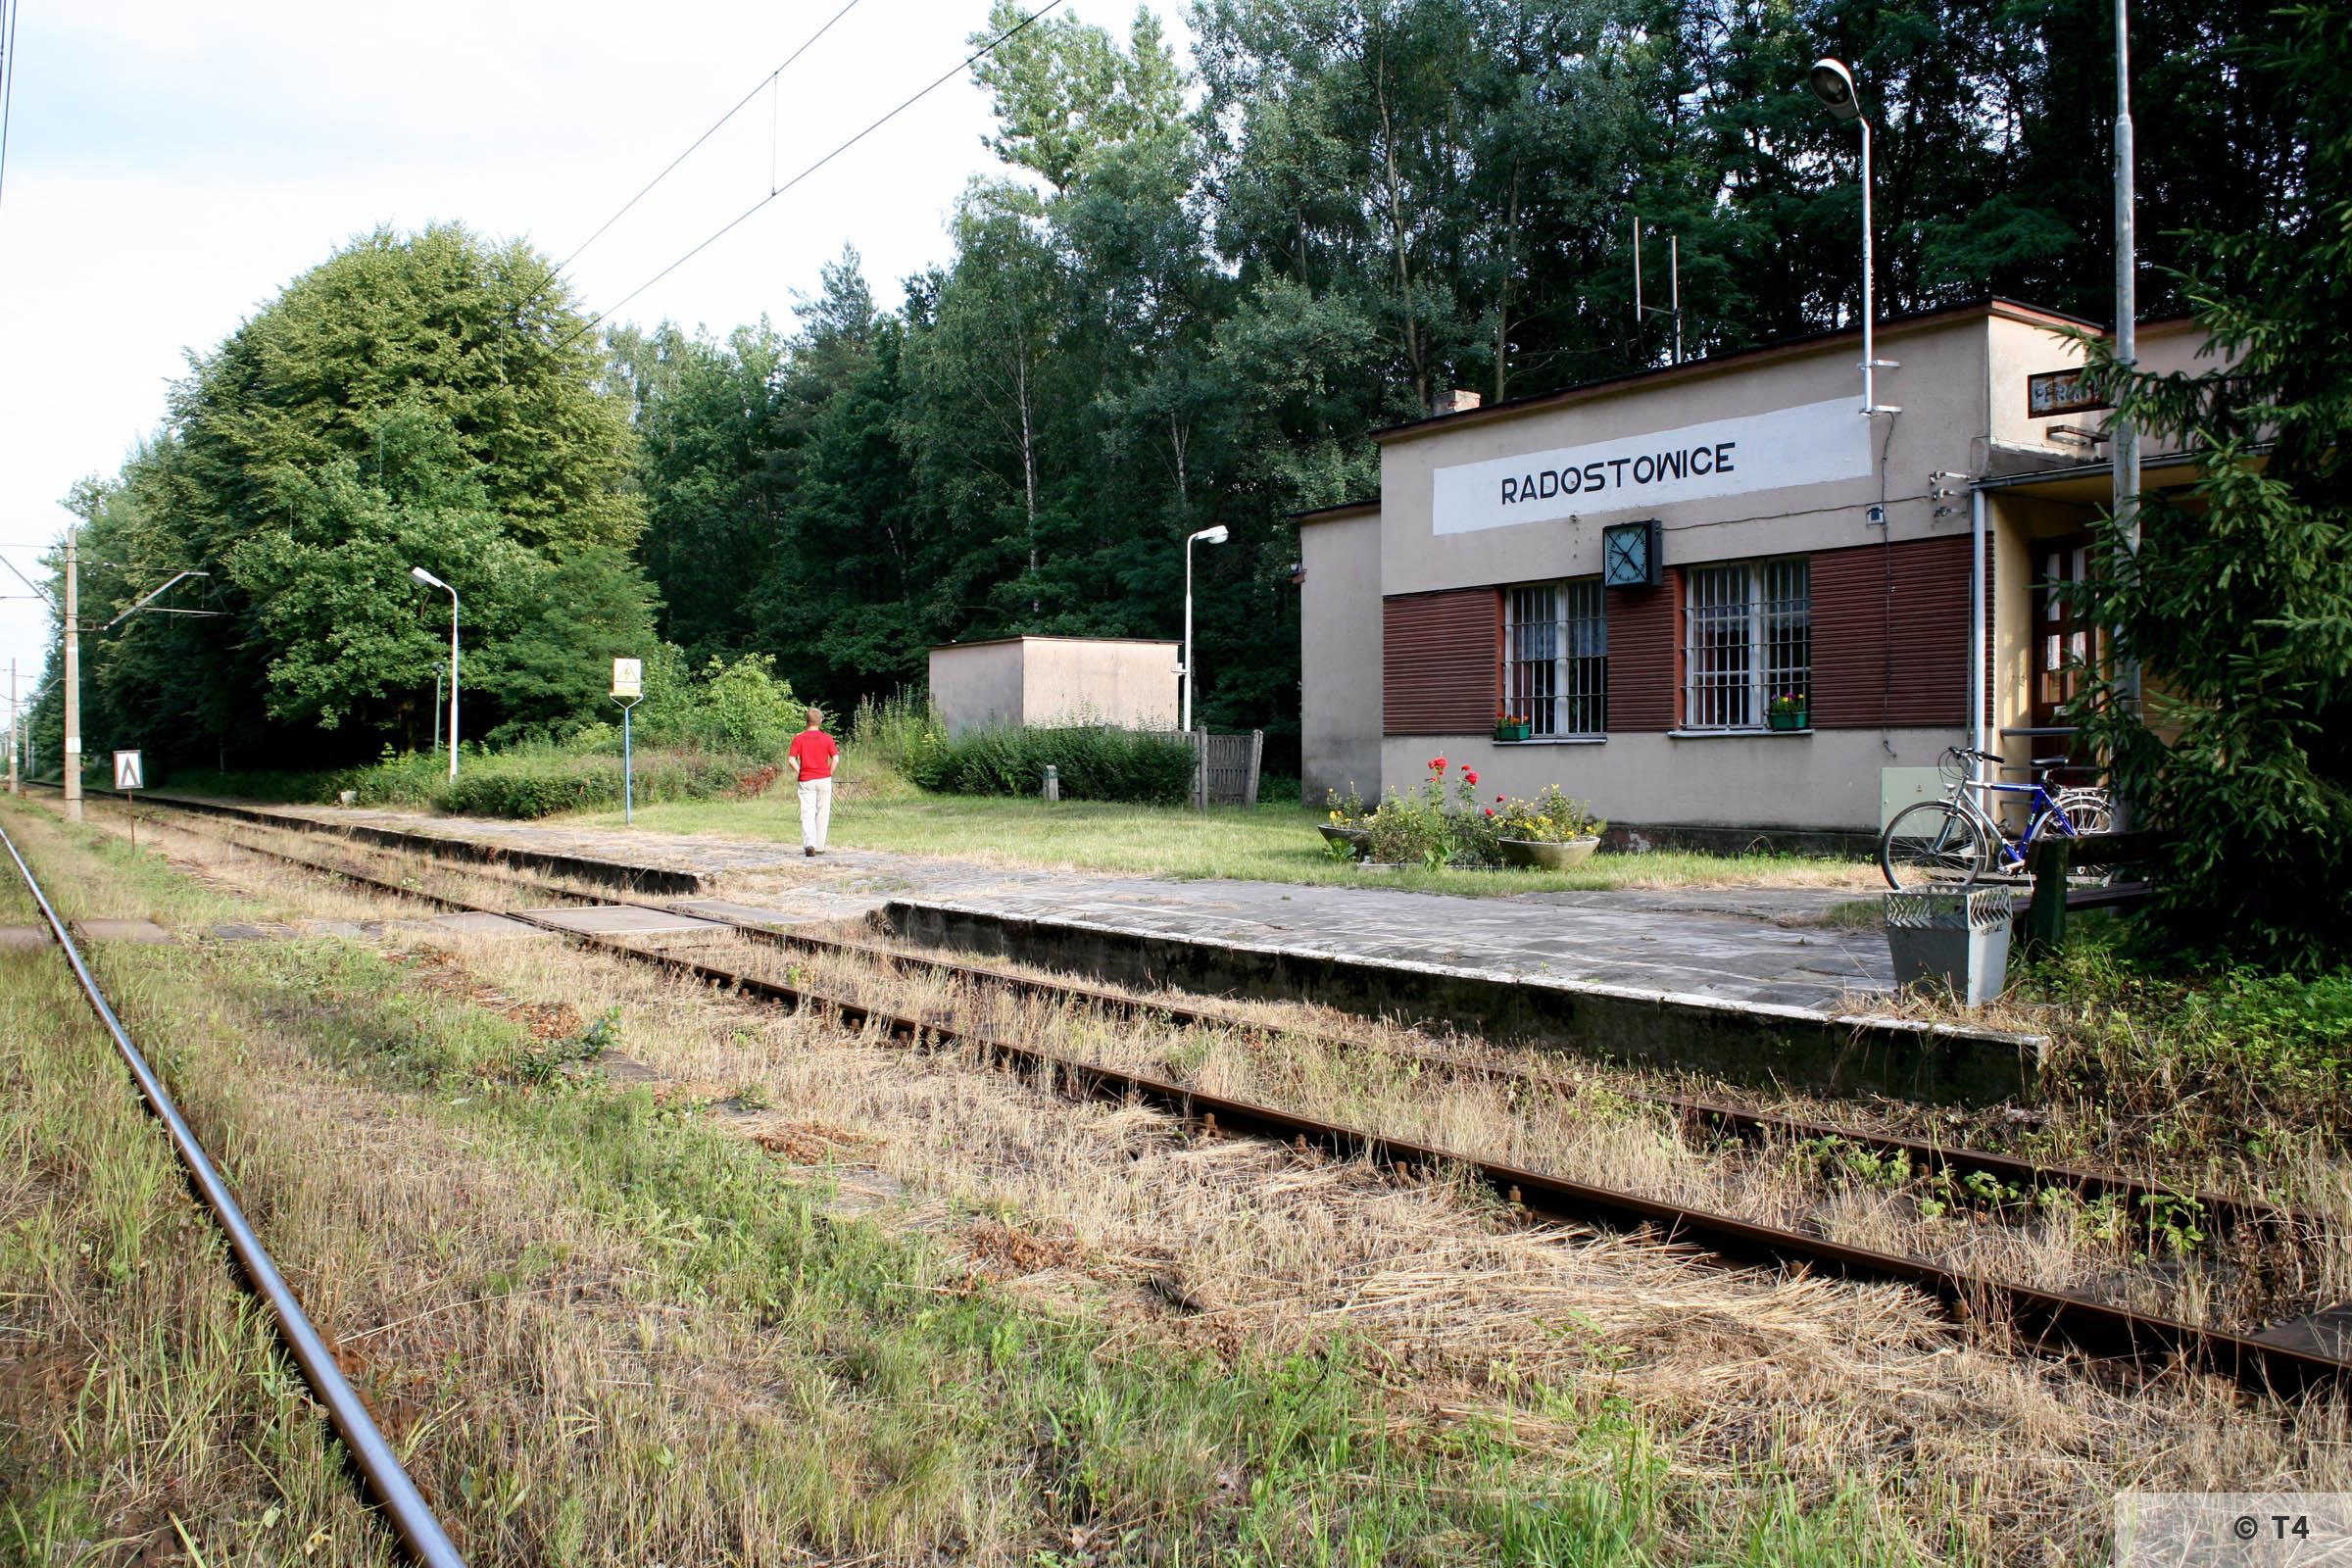 Radostowice railway statiuon. 2007 T4 8998